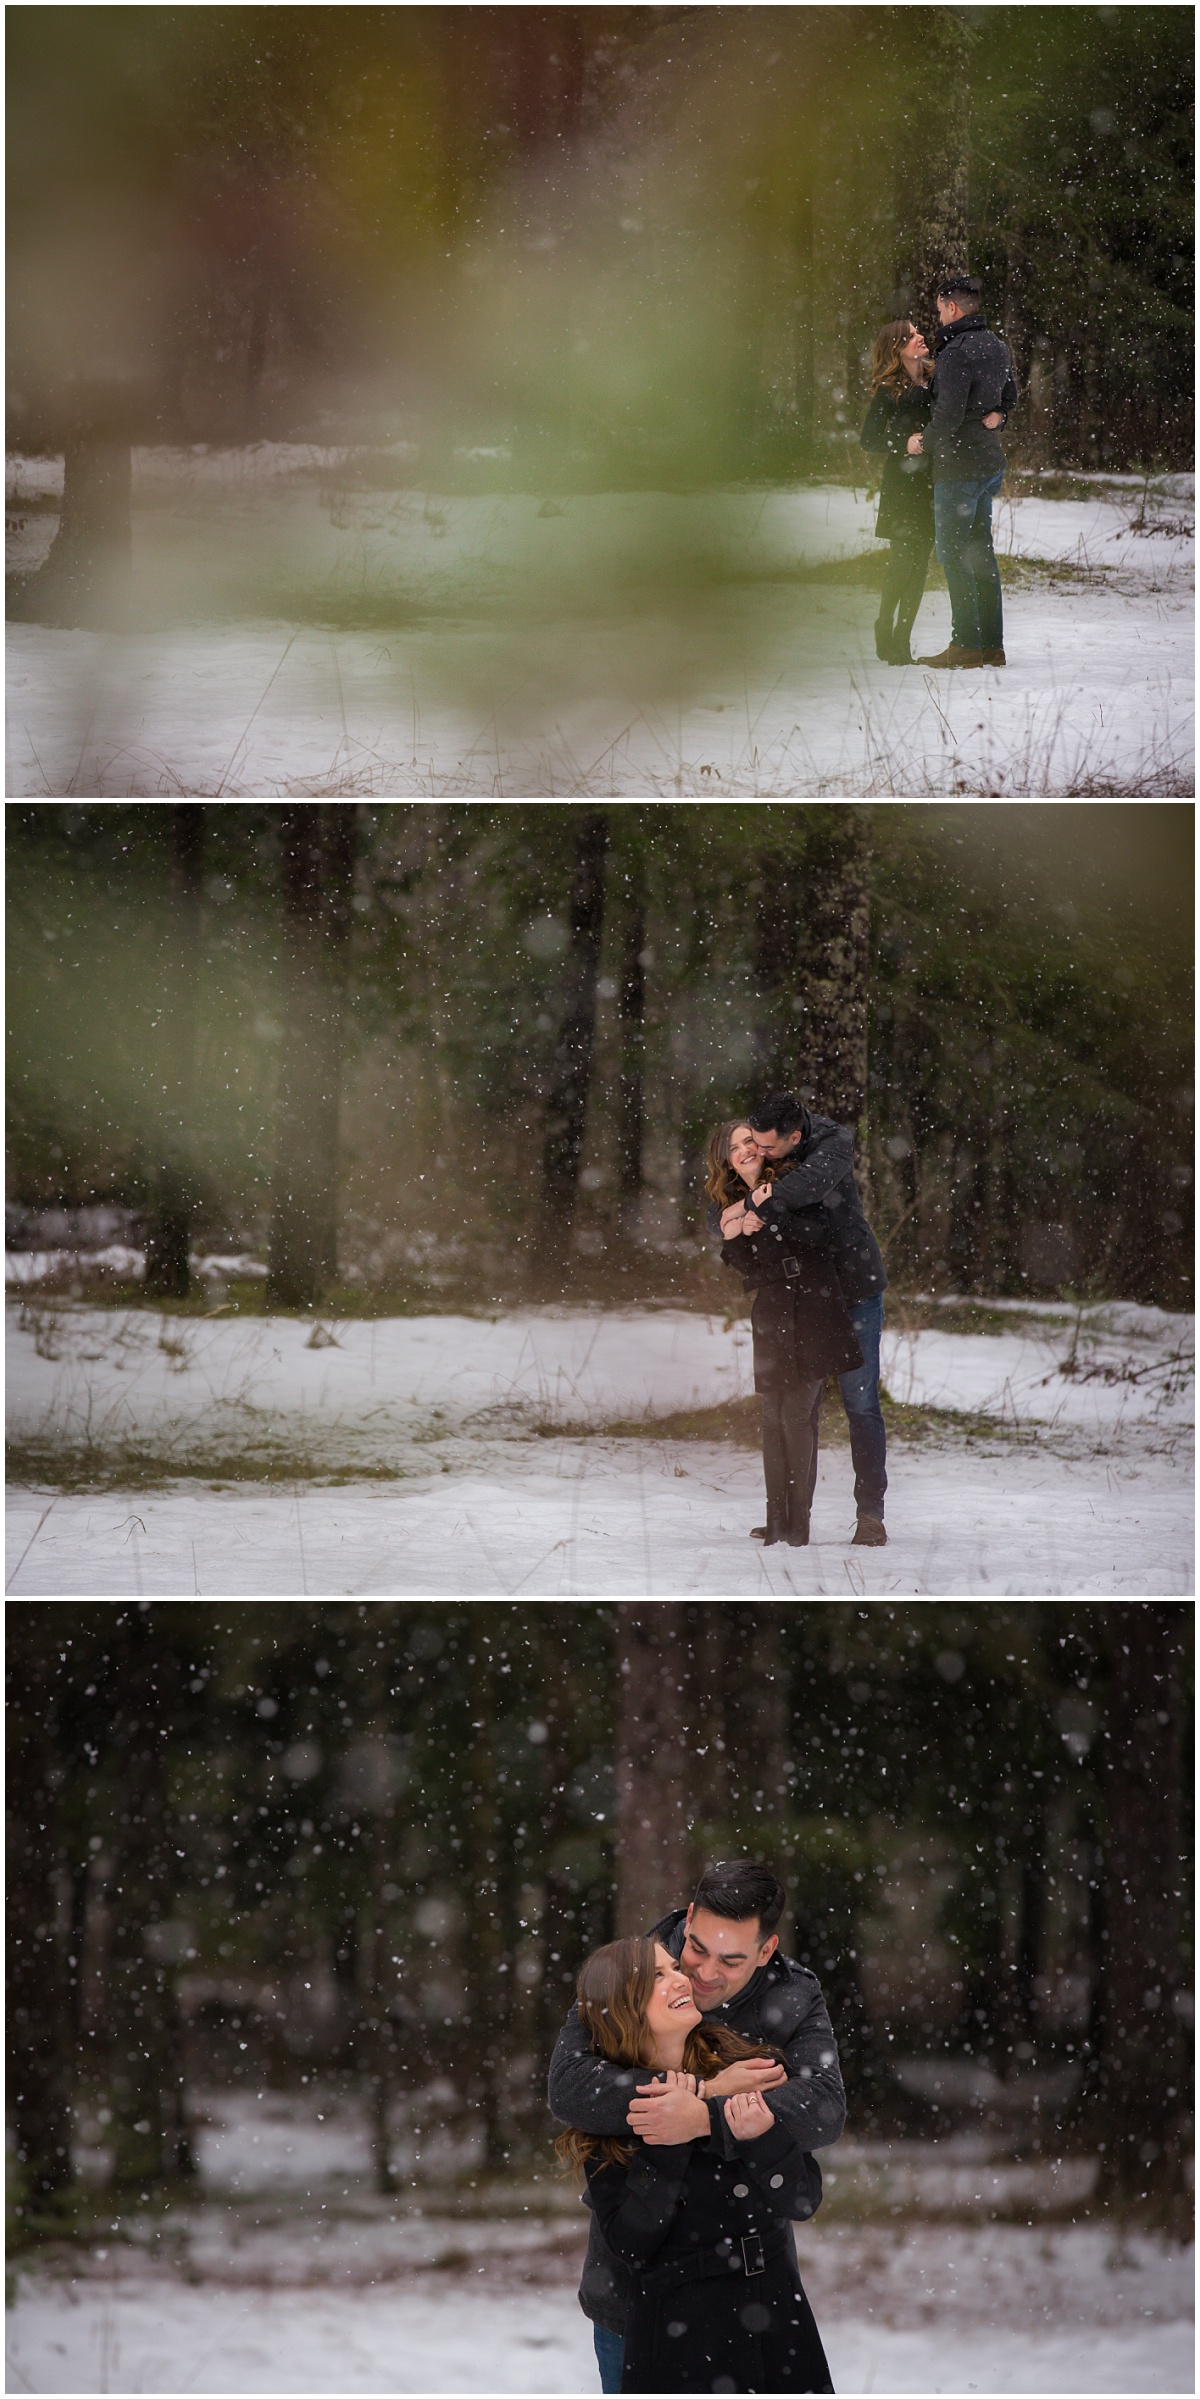 Amazing Day Photography - Chiliwack Lake Couple Session - Snowy Session -Langley Photographer (2).jpg